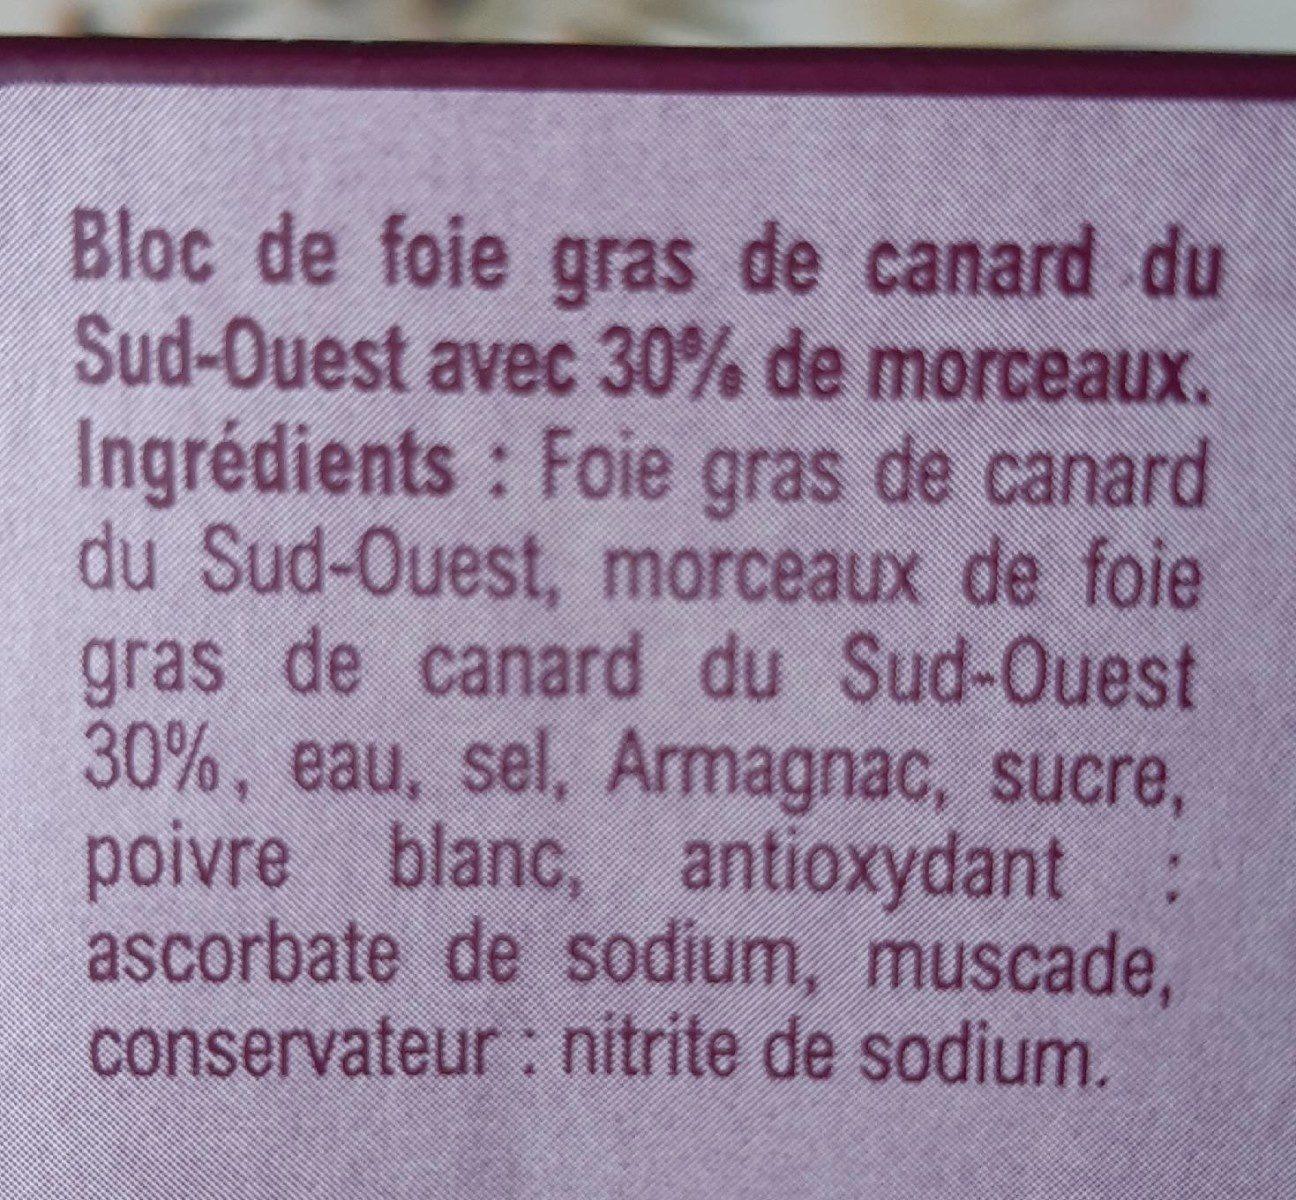 Bloc de foie gras de canard du sud -ouest - Ingrediënten - fr